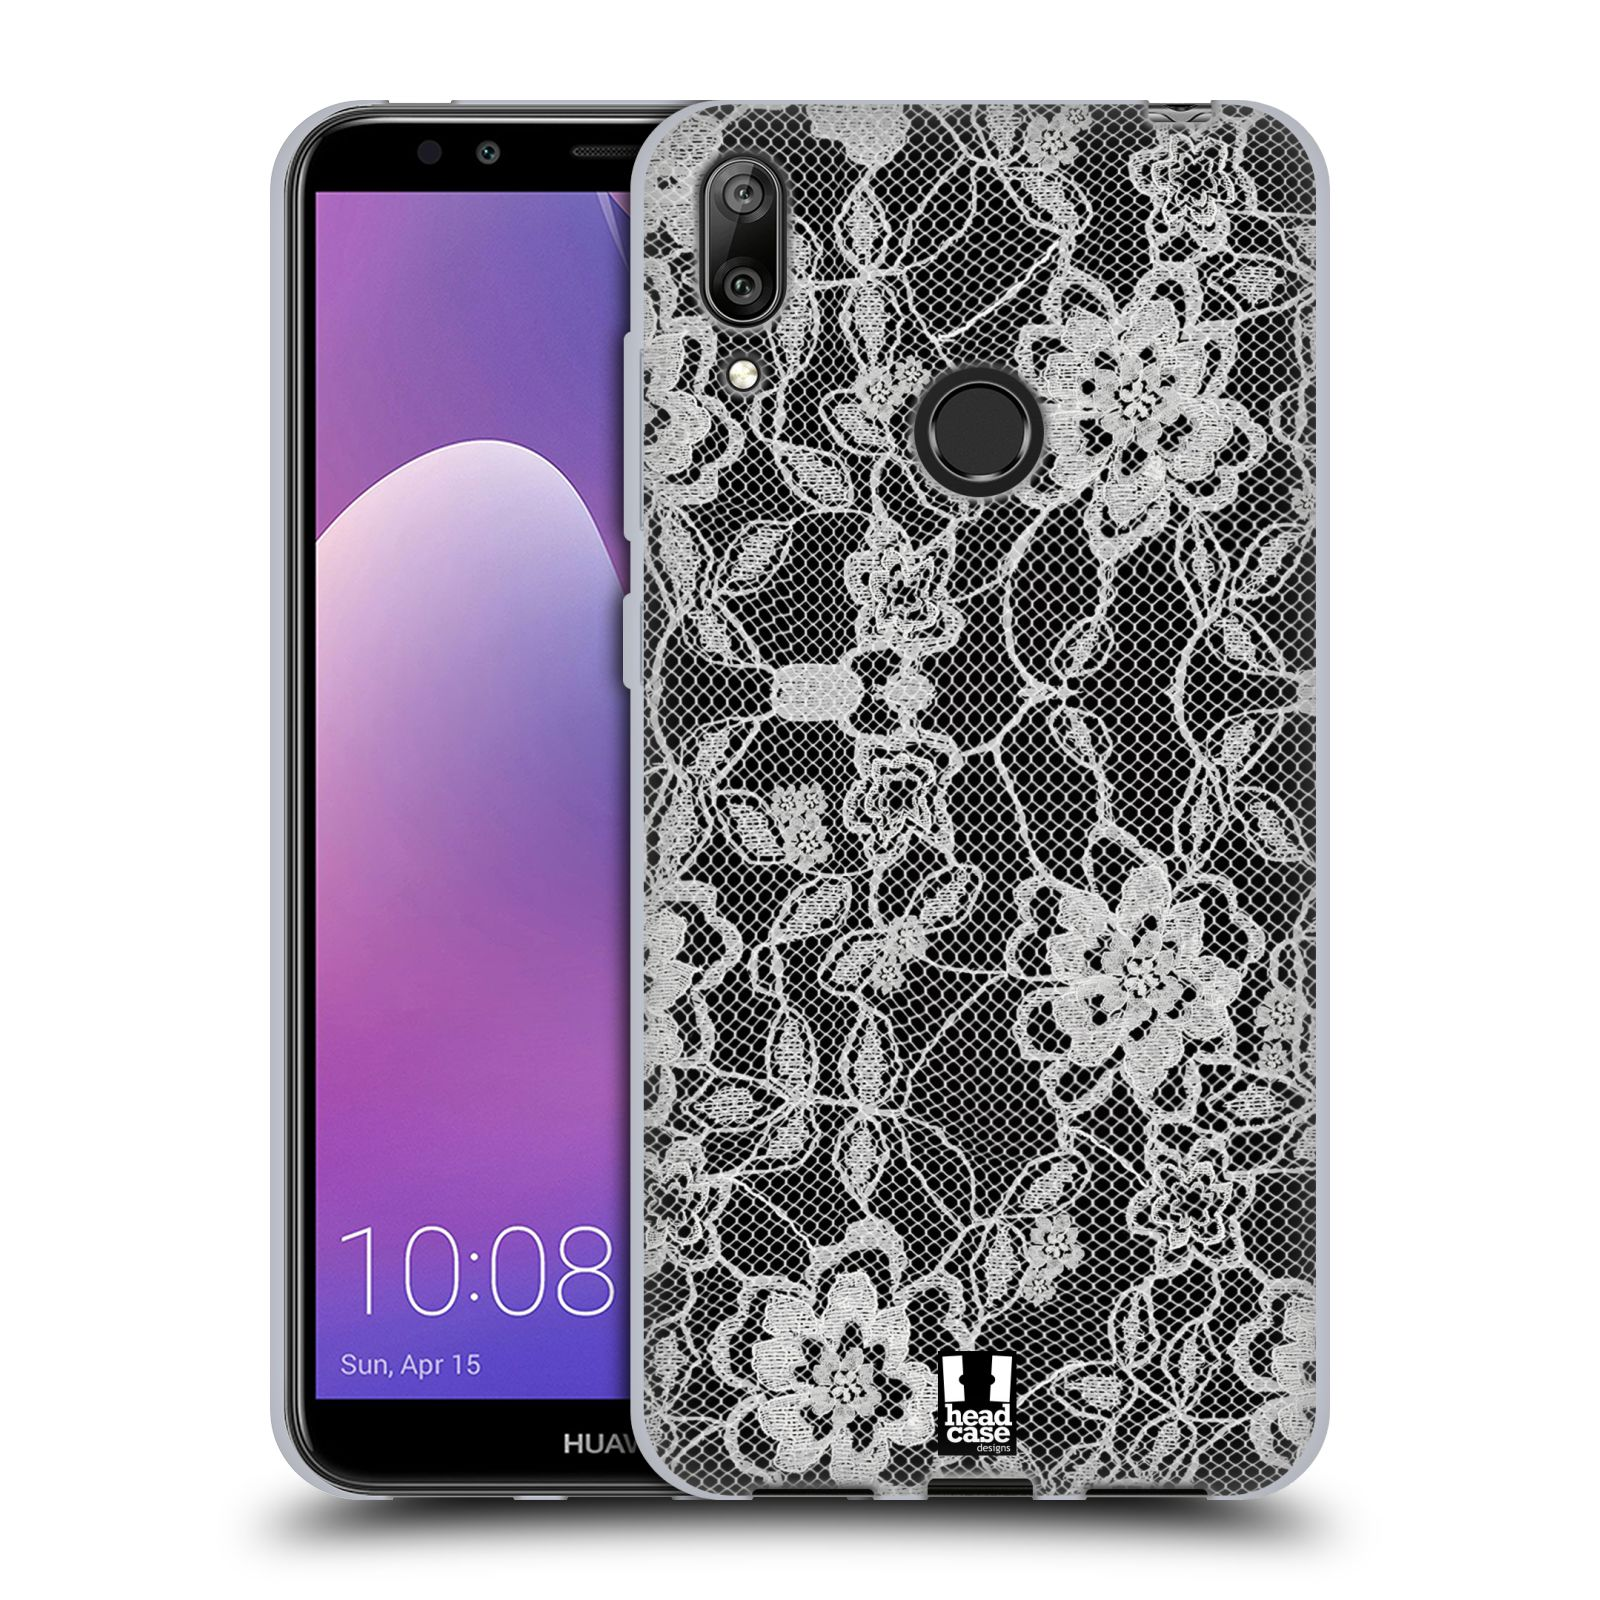 Silikonové pouzdro na mobil Huawei Y7 (2019) - Head Case - FLOWERY KRAJKA